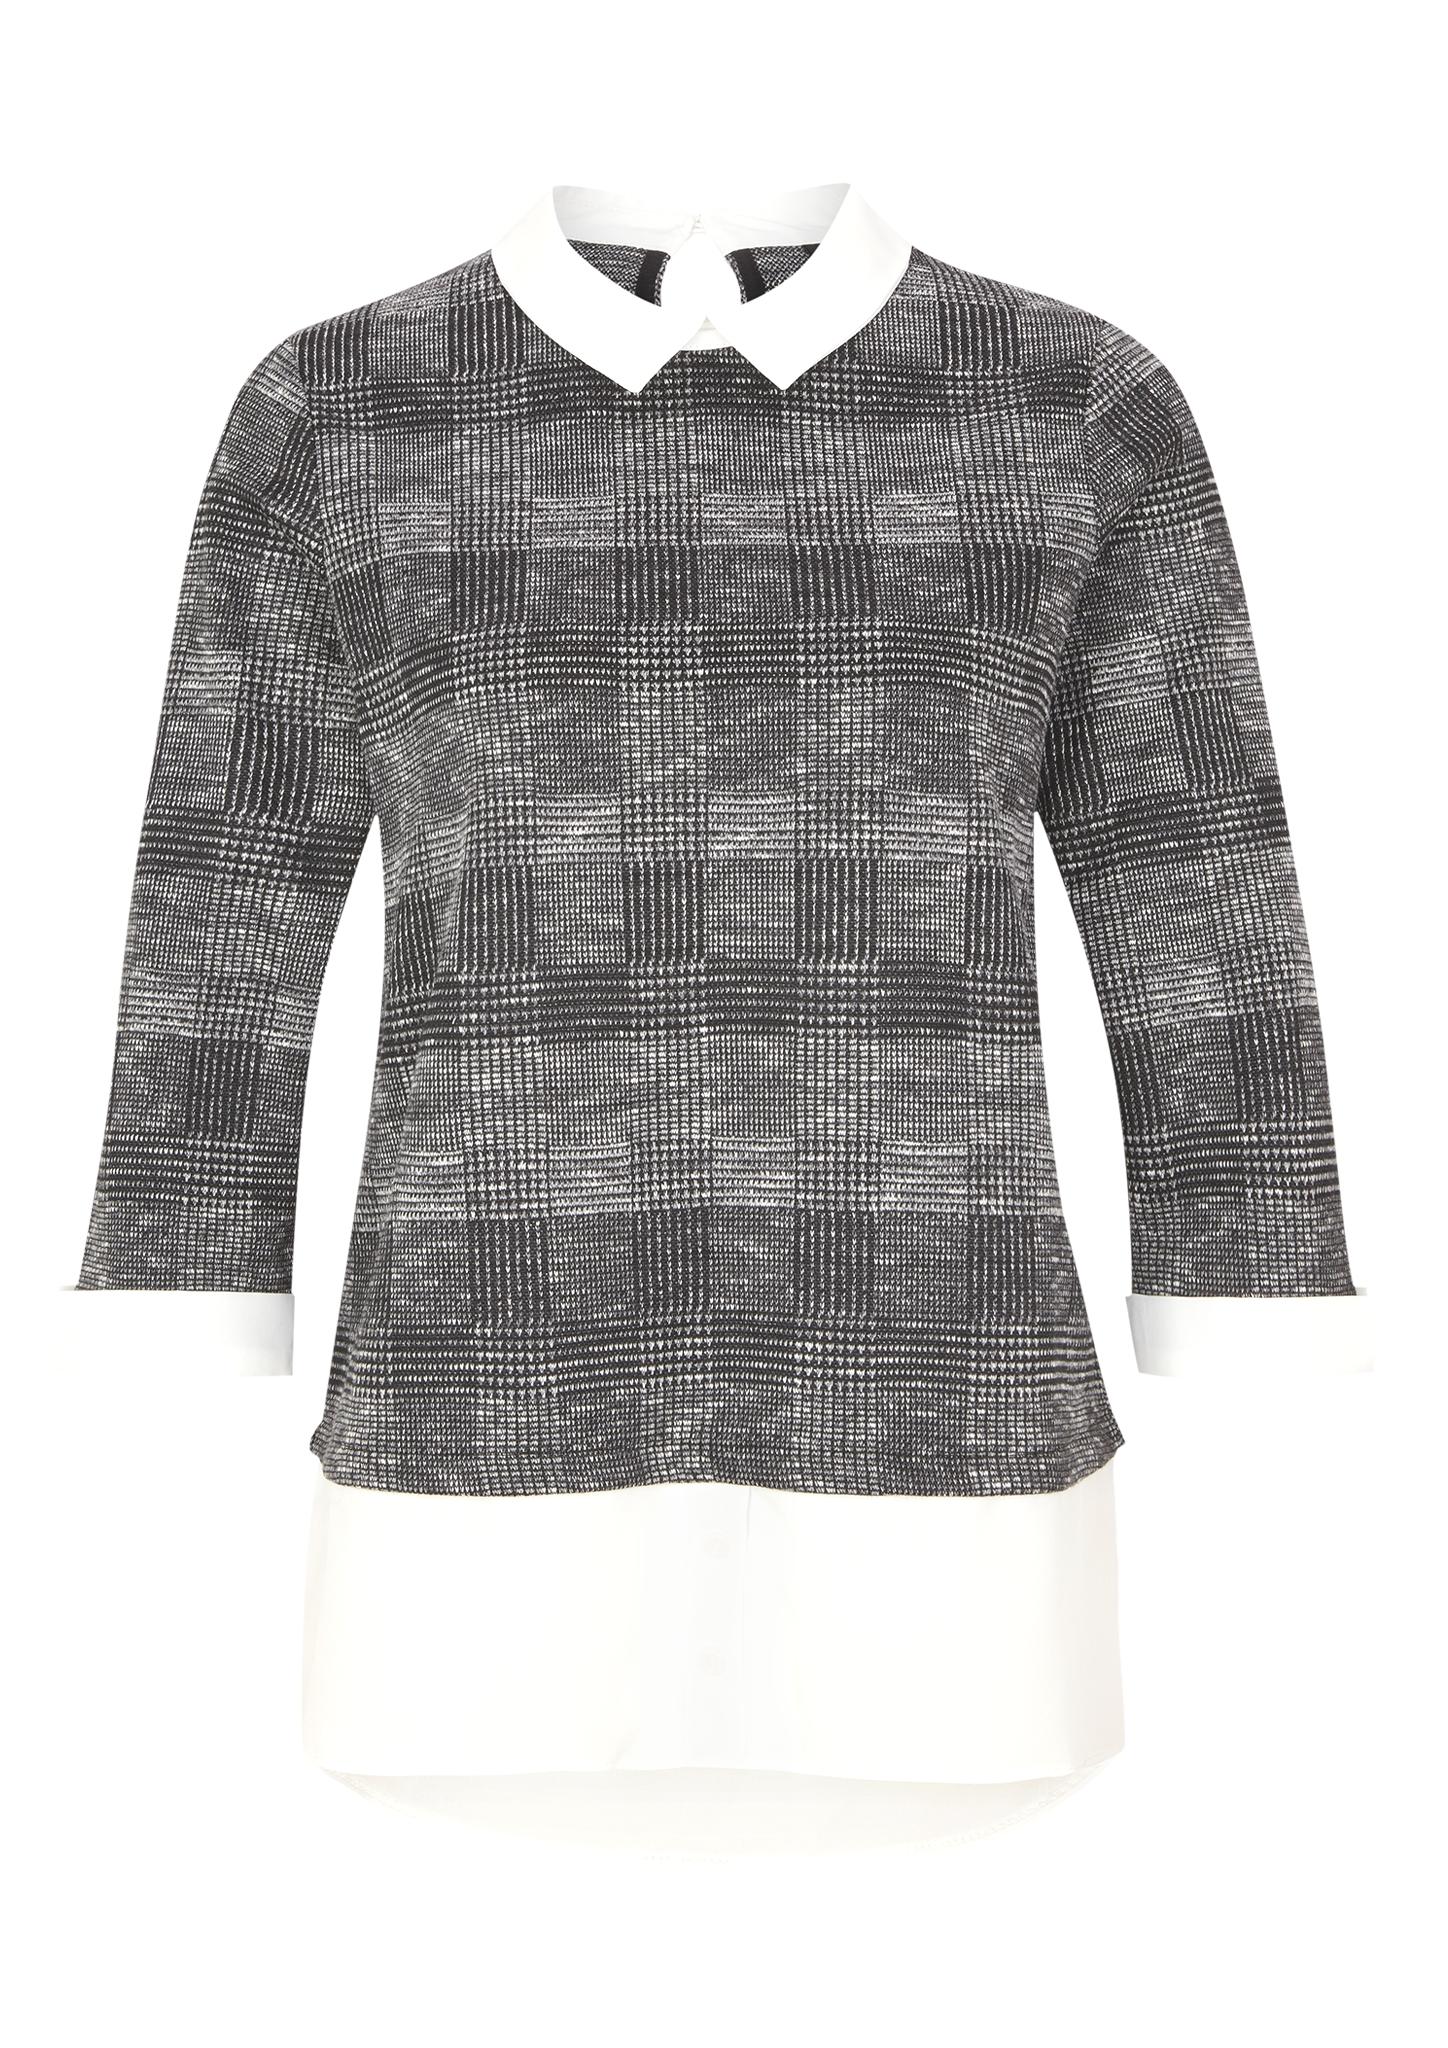 Image of Layer-Shirt mit 3/4-Arm